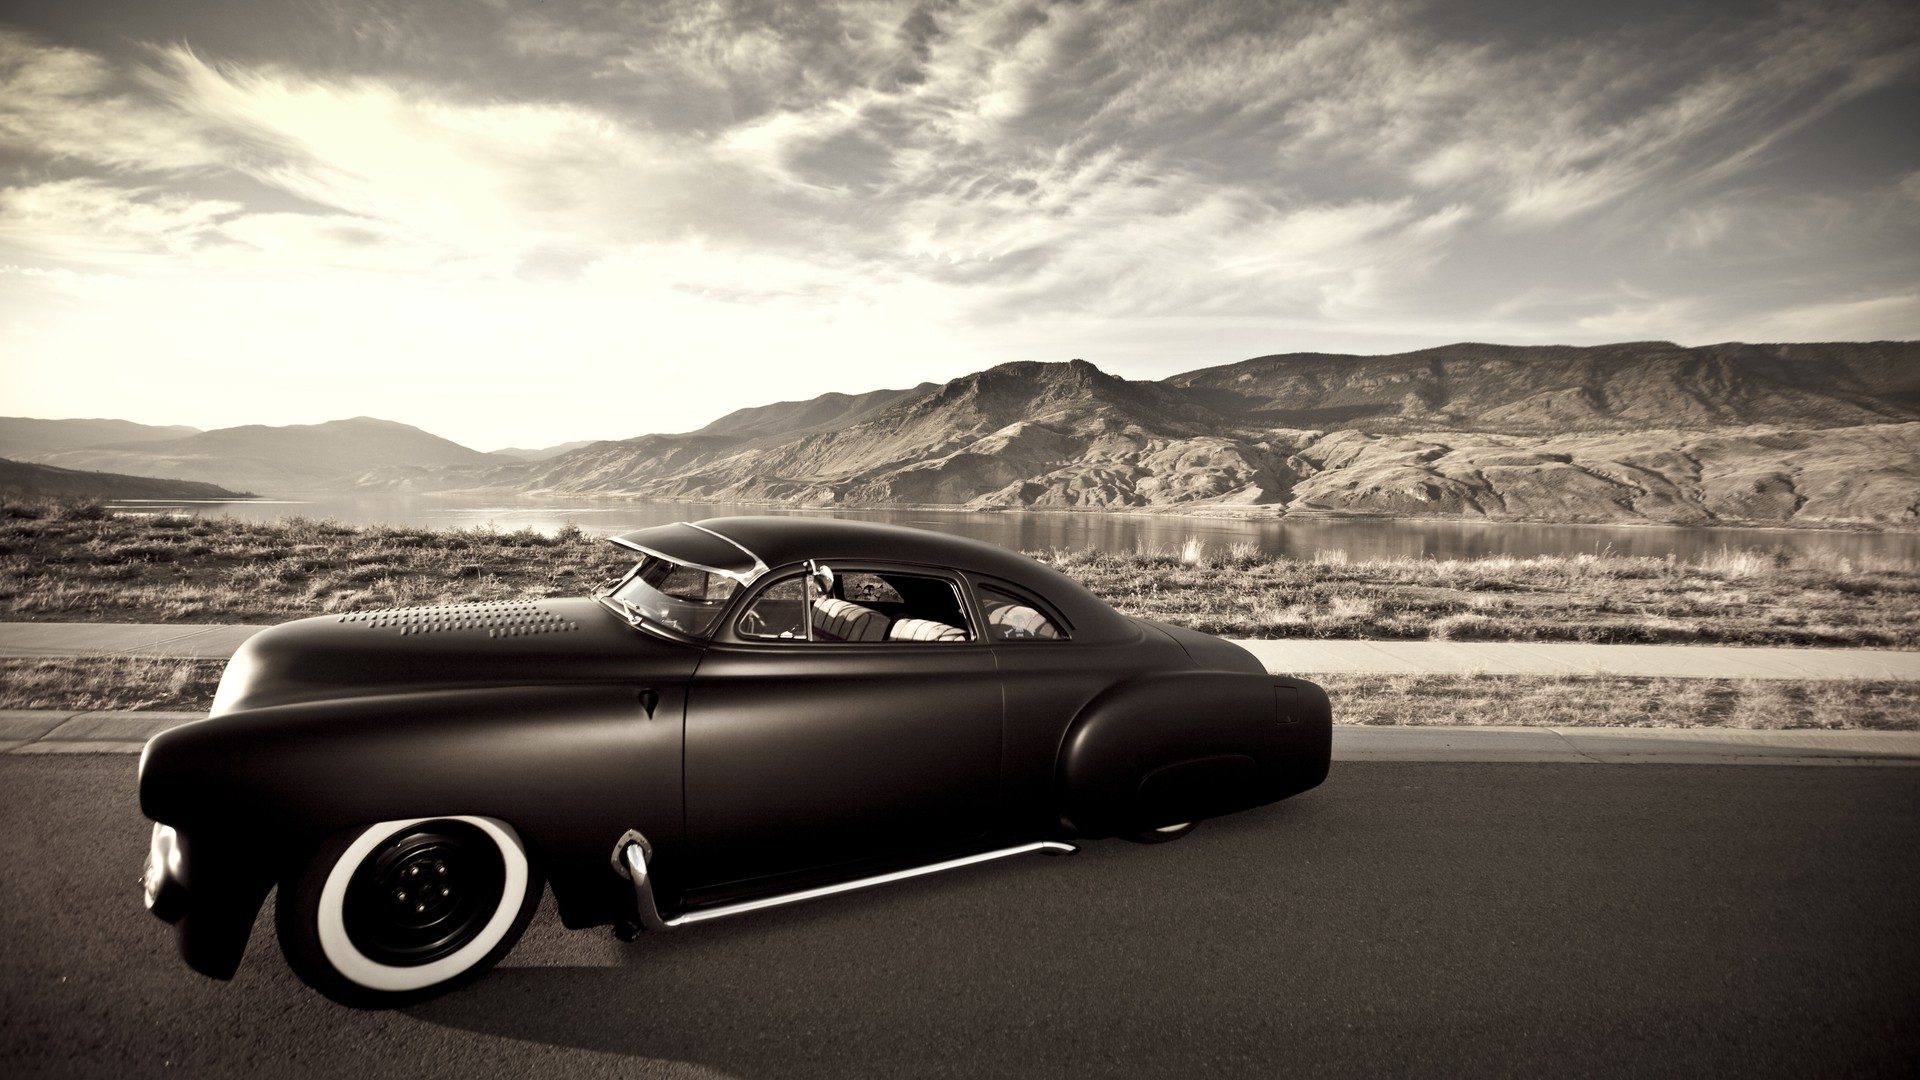 Vehicles Cars Rat Rod Hot Rod Custom Lowrider Sepia